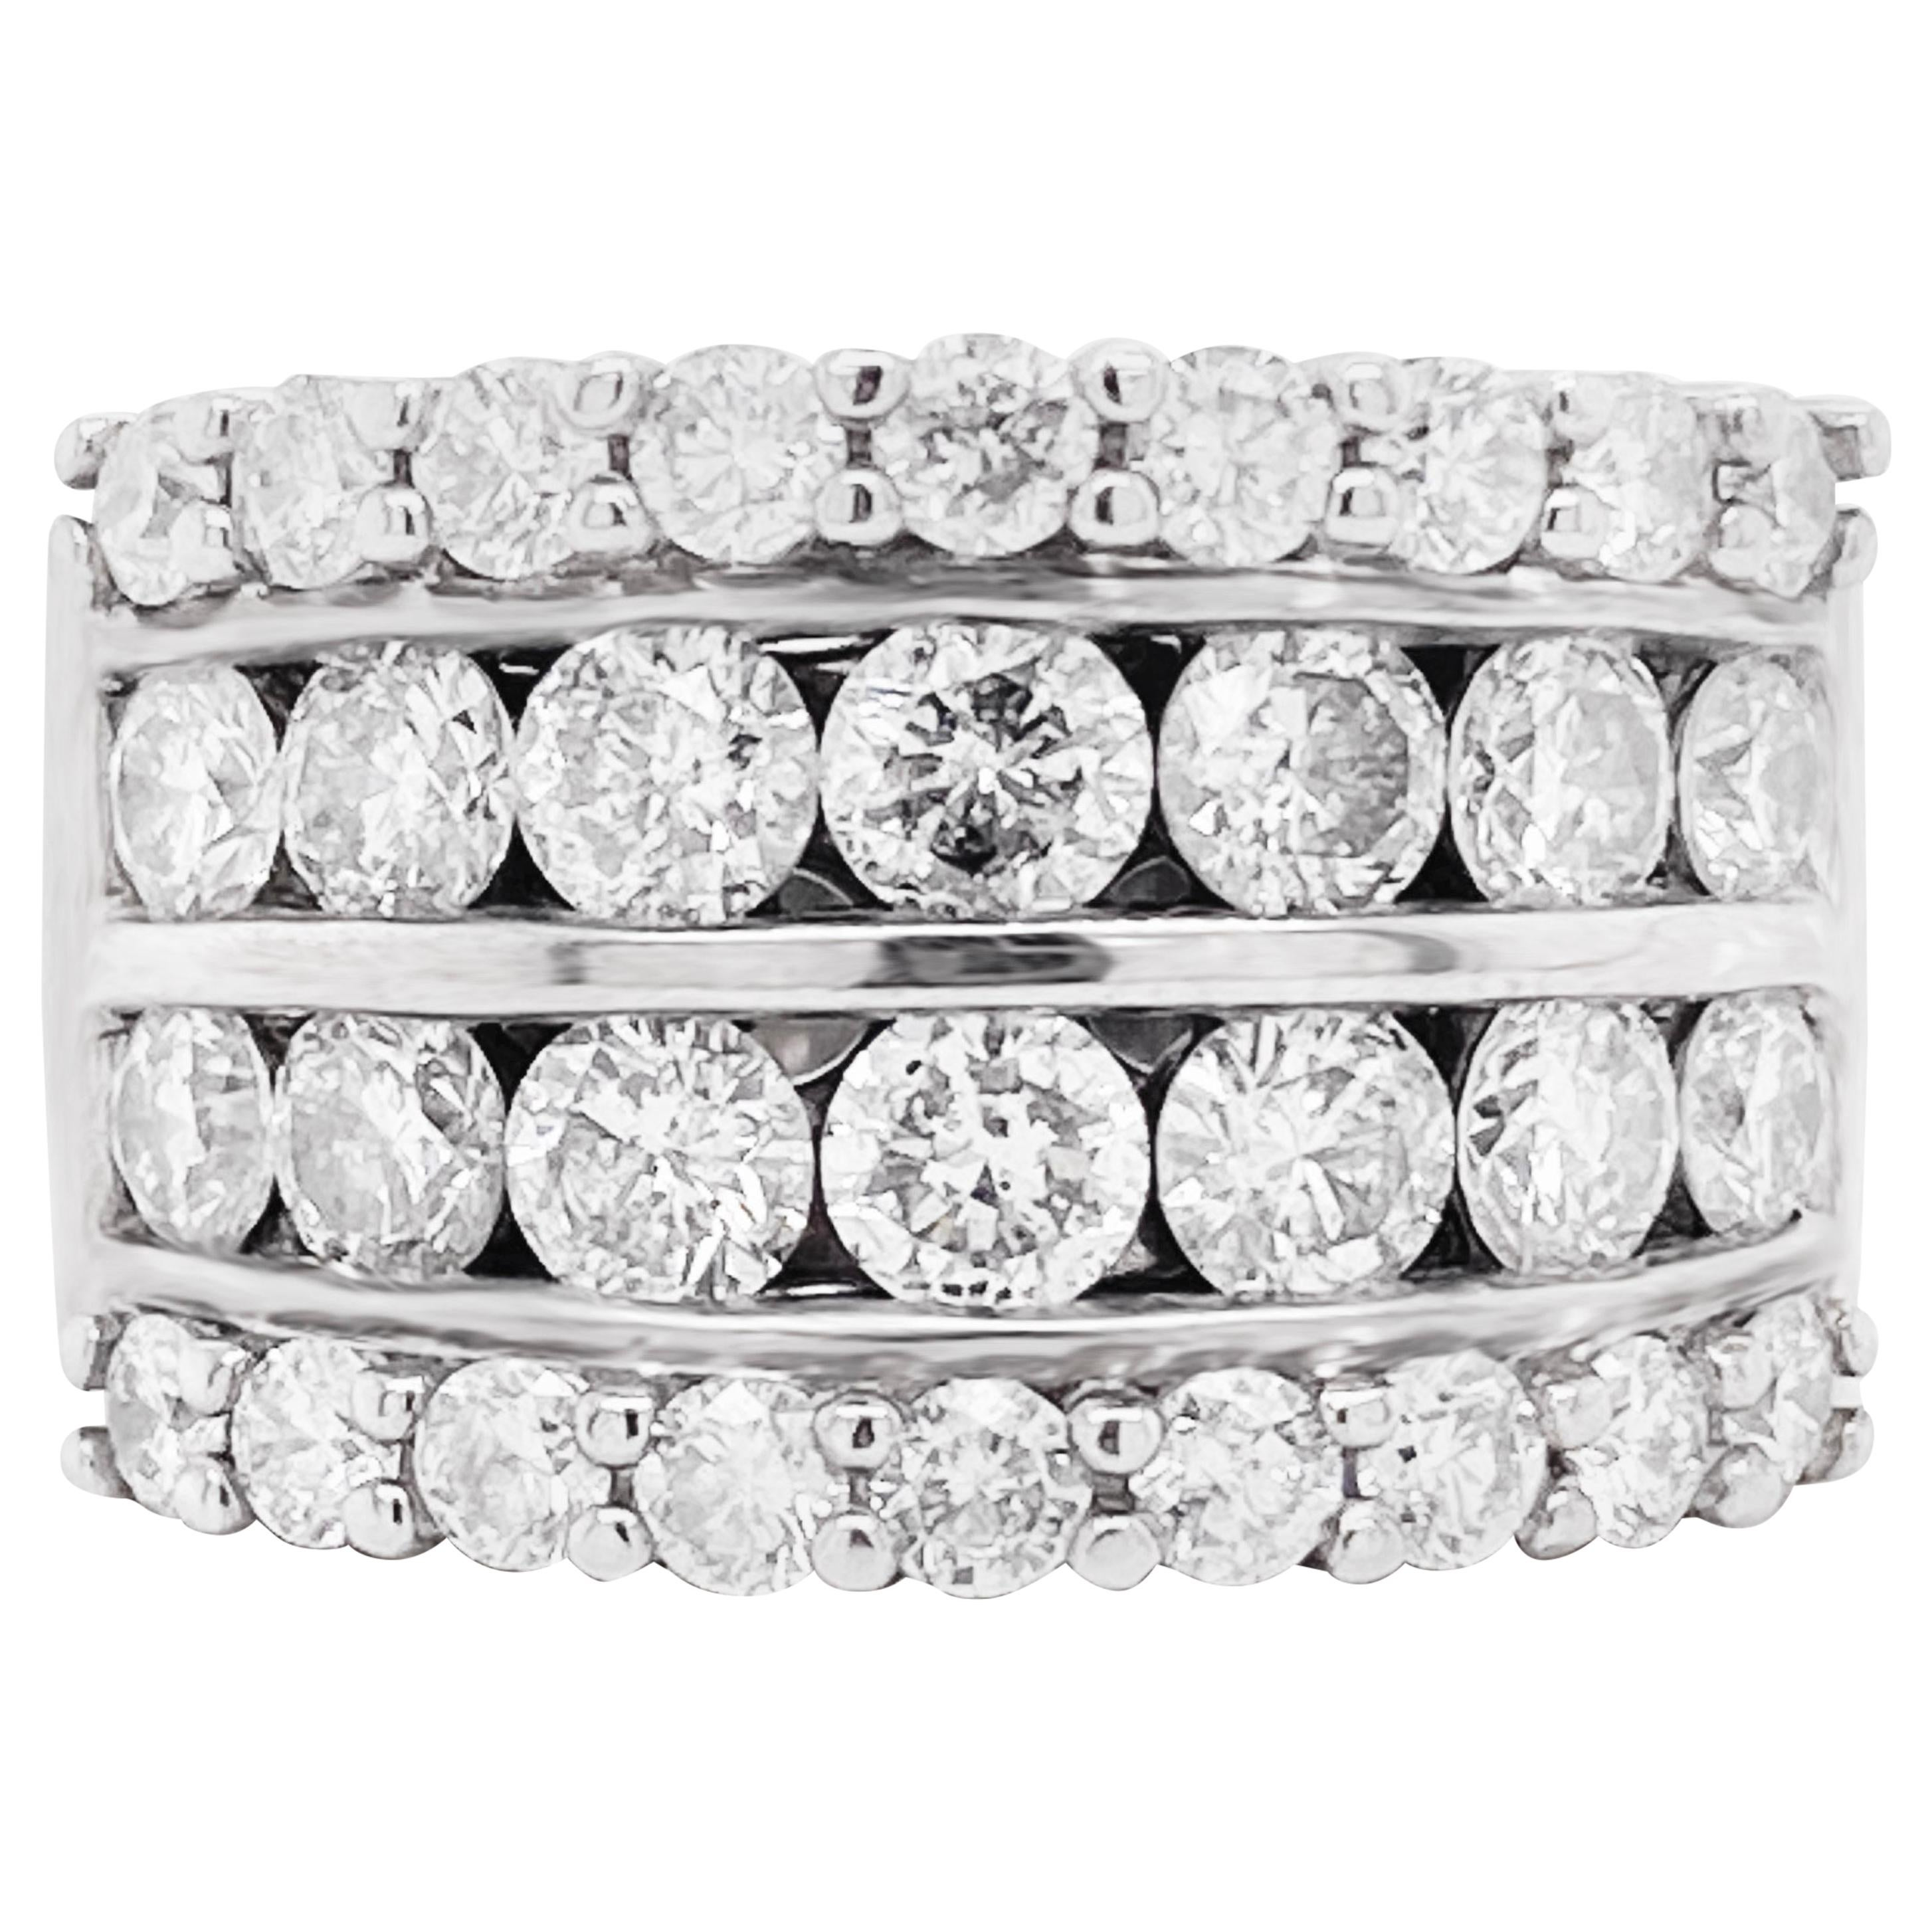 Diamond Band Ring, 14 Karat Gold, 3.5 Carat, 4 Rows of Diamonds, Anniversary